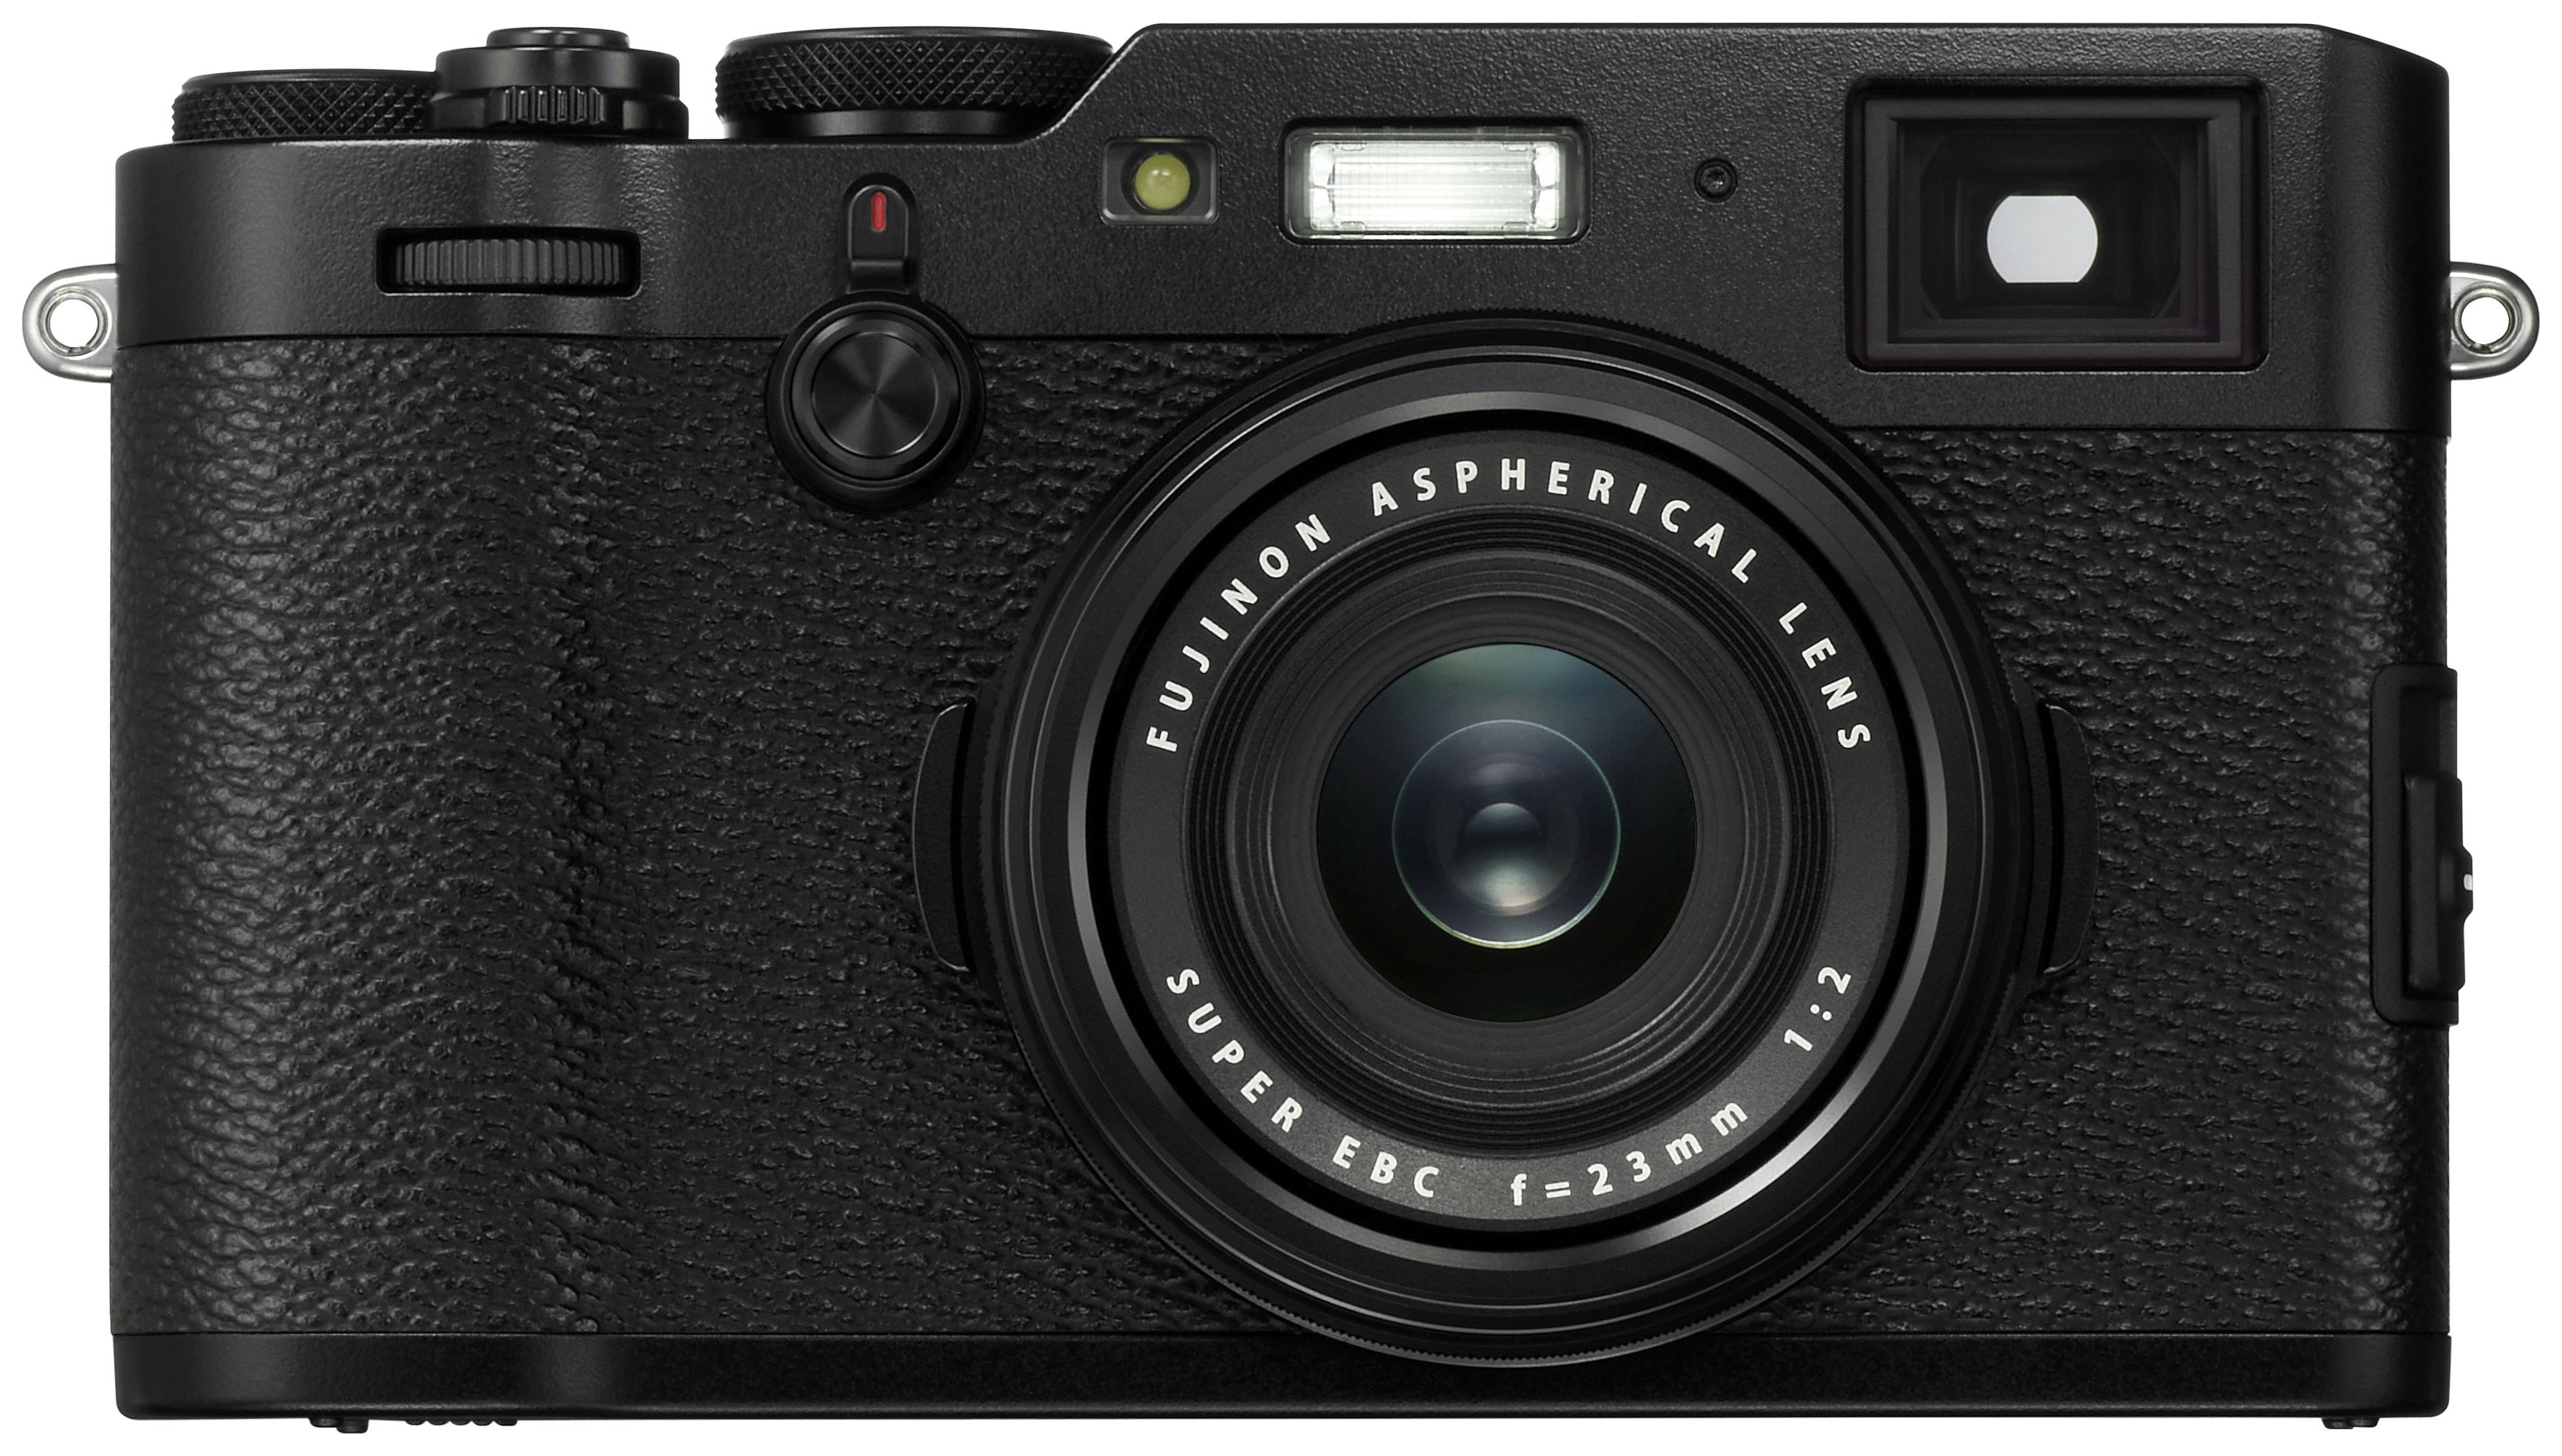 Image of Fujifilm X100F Mirrorless Camera Black